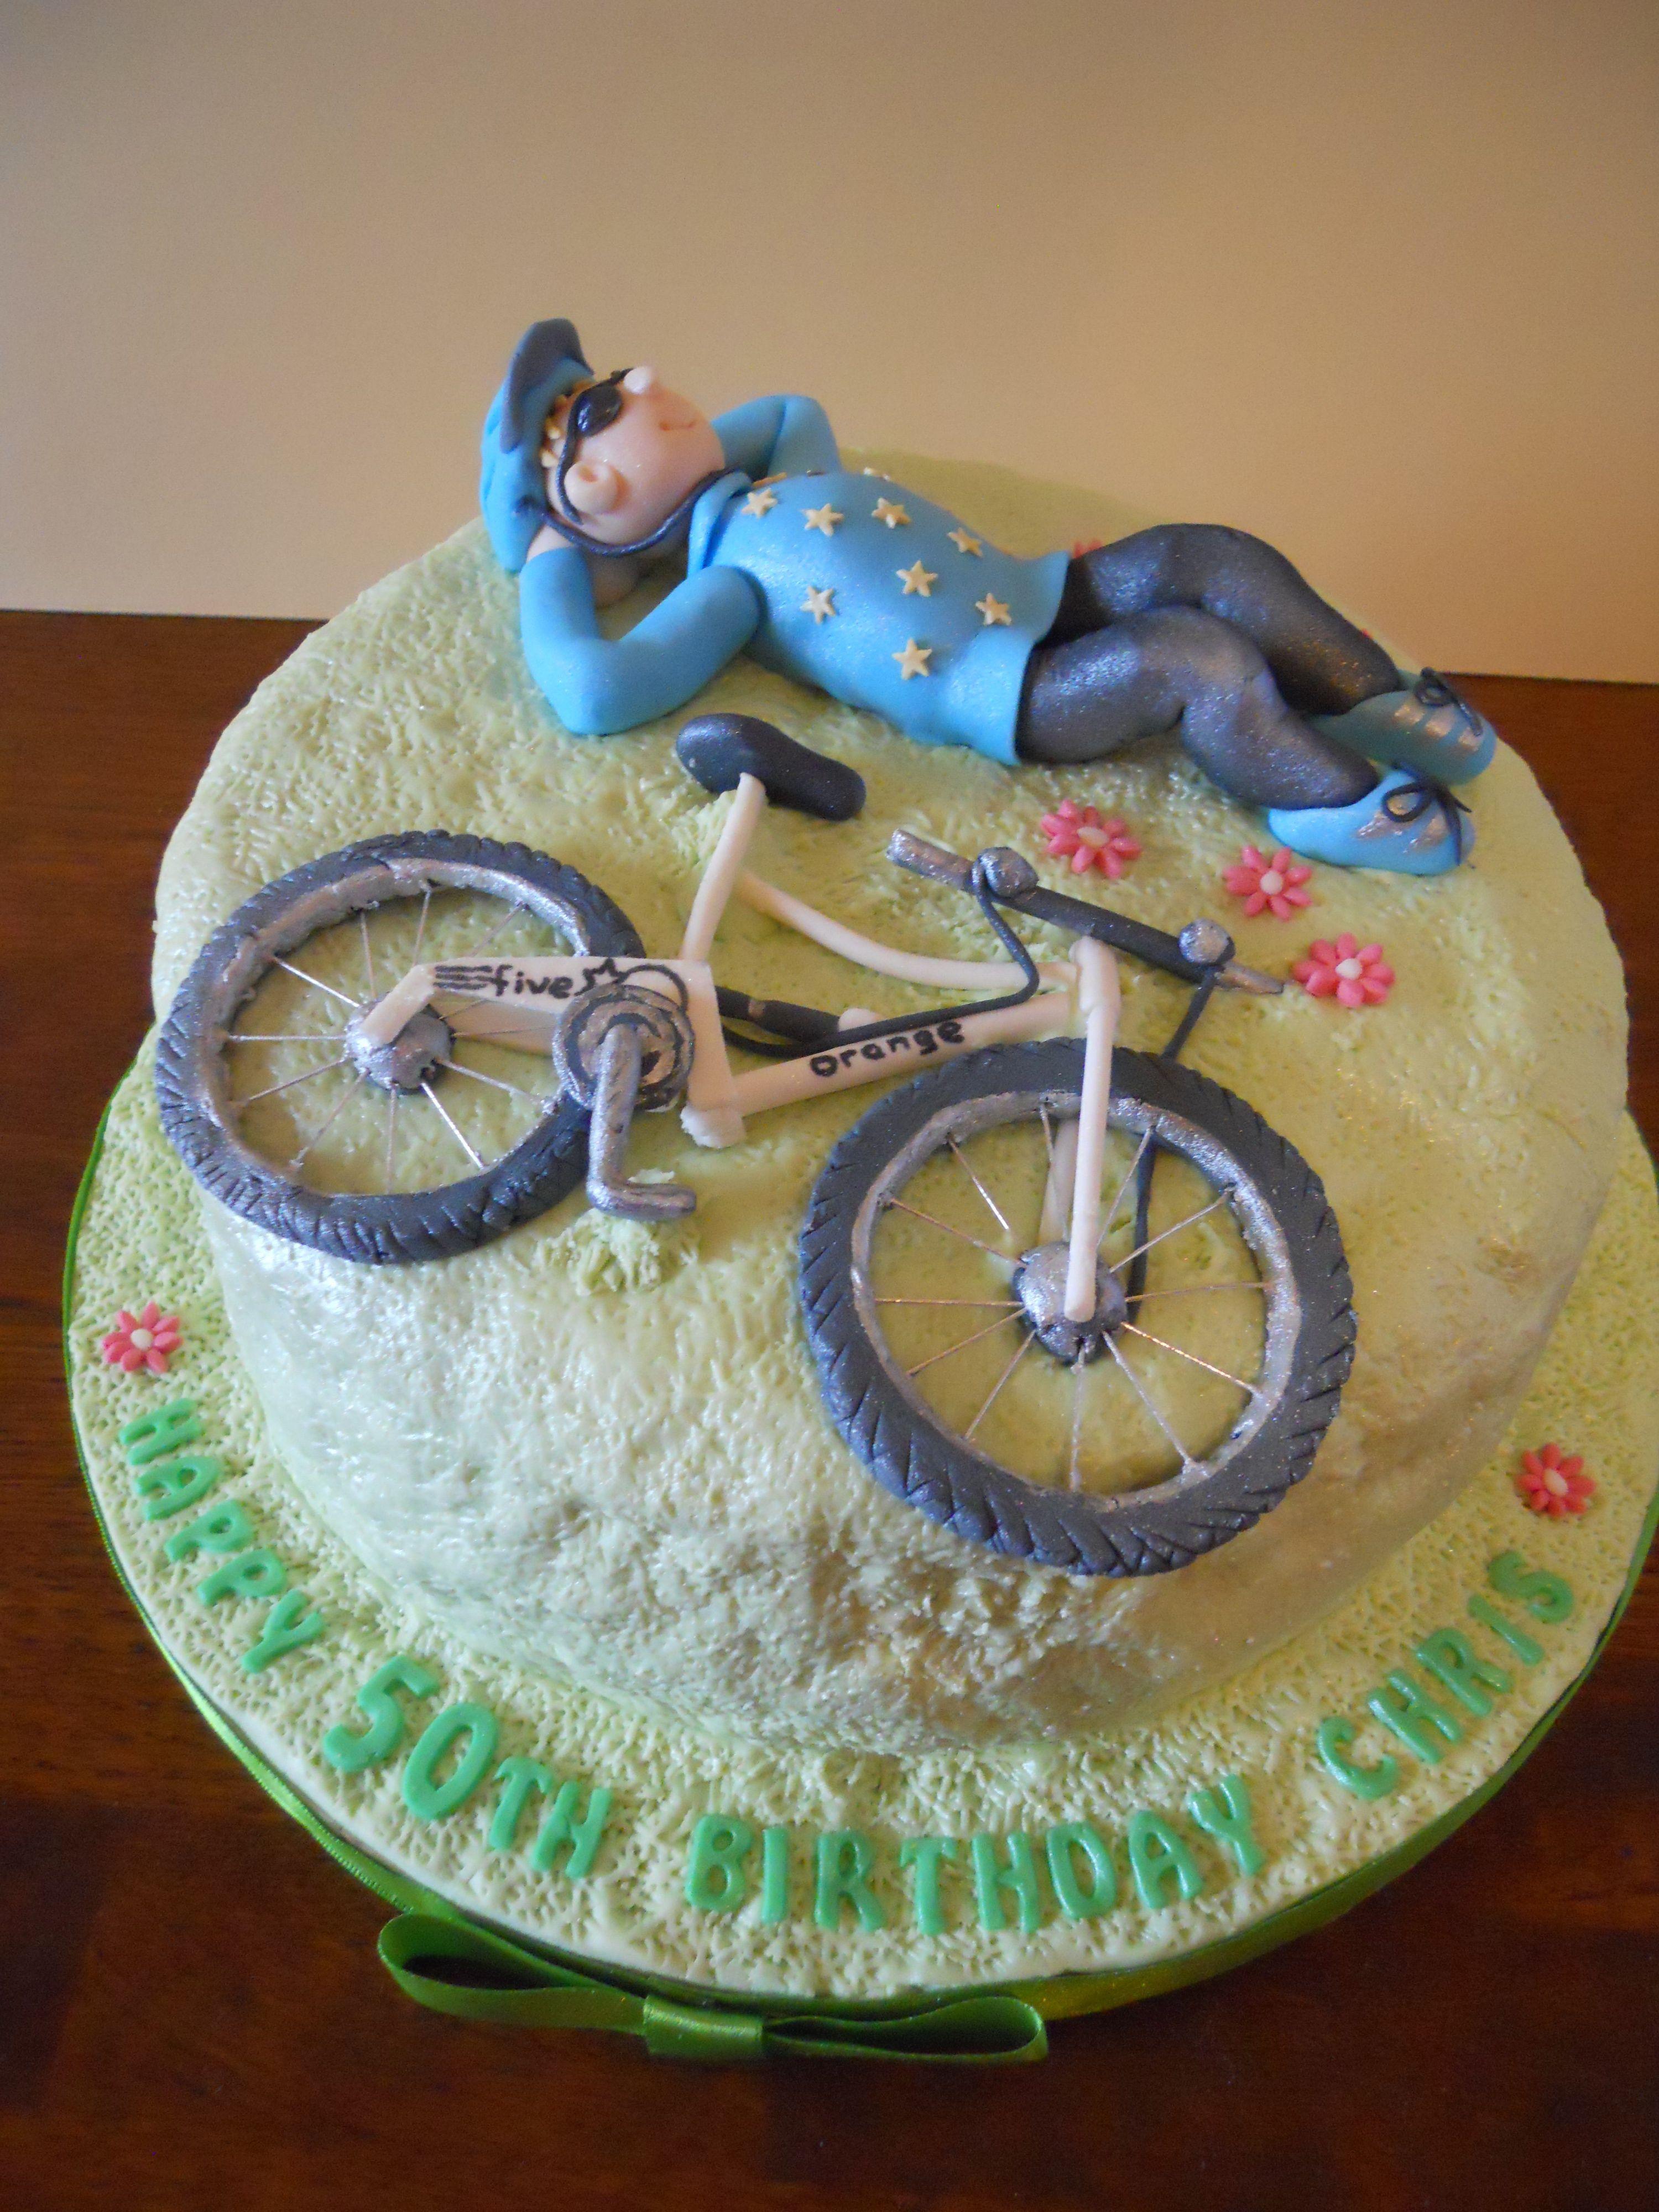 An Intricate Mountain Bike Cake Kks Mountain Bike Cake